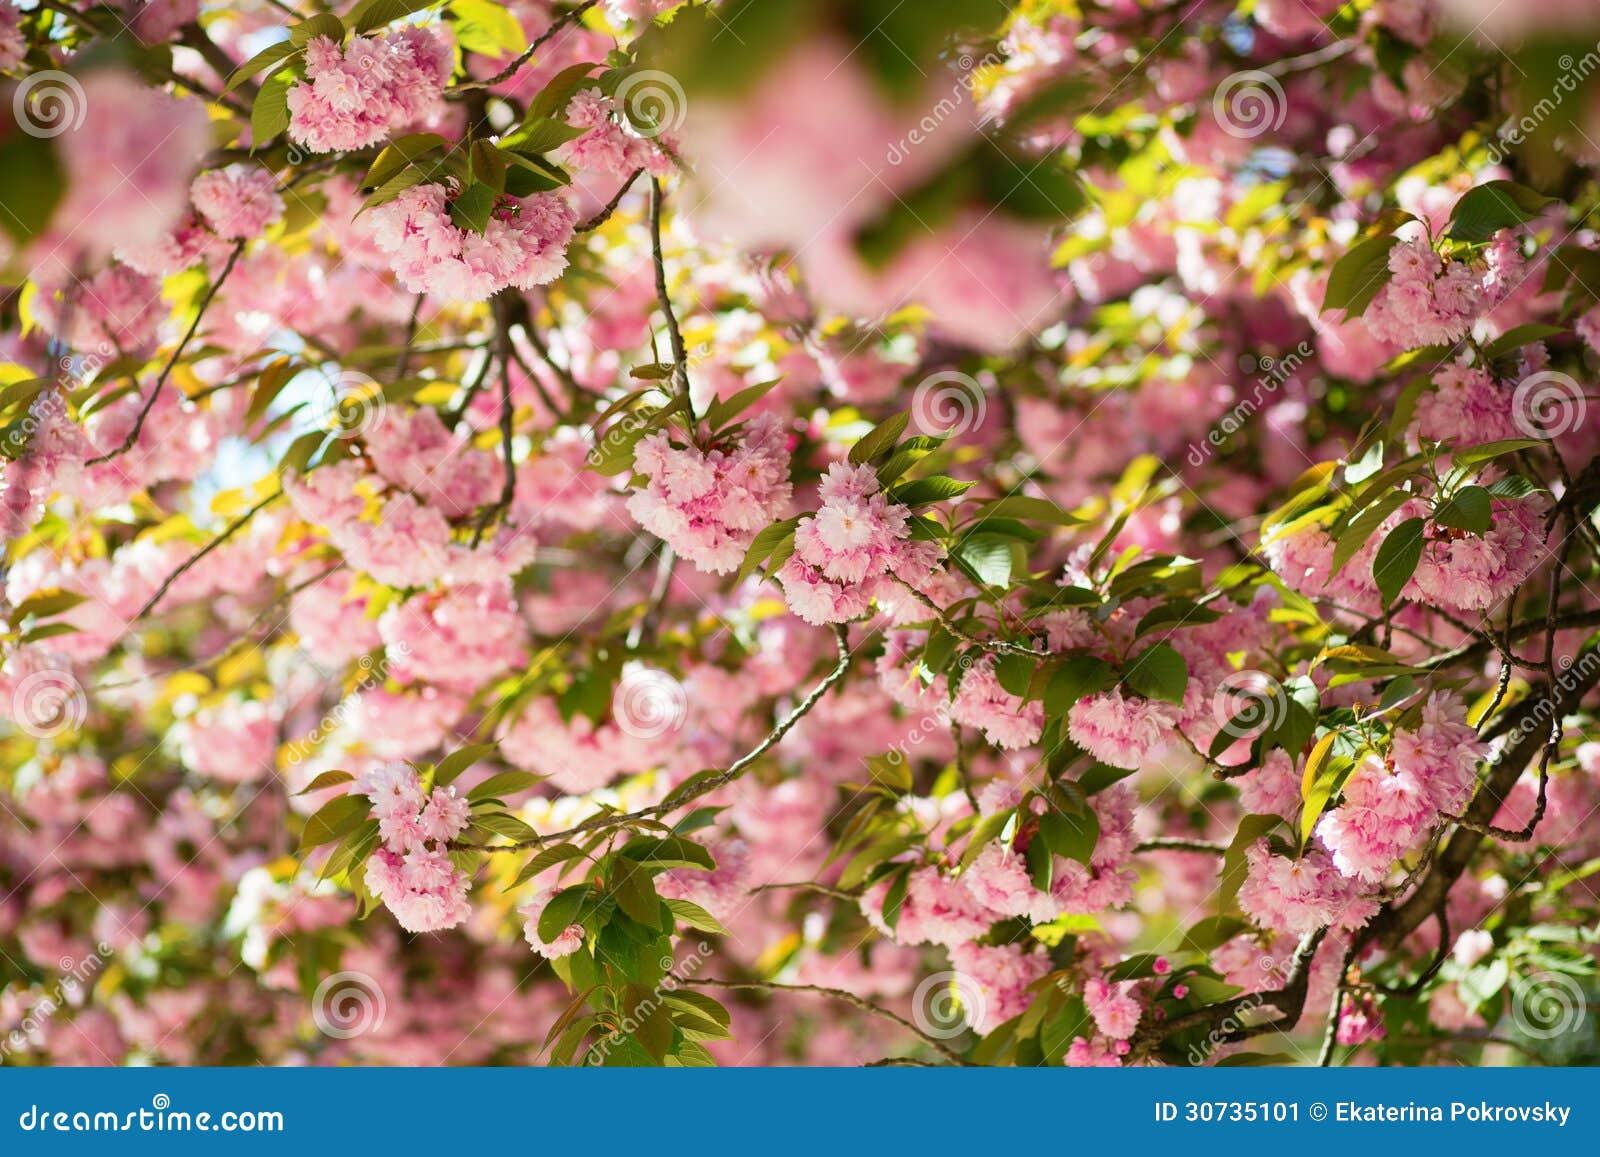 sch ner bl hender baum mit rosa blumen stockbild bild. Black Bedroom Furniture Sets. Home Design Ideas